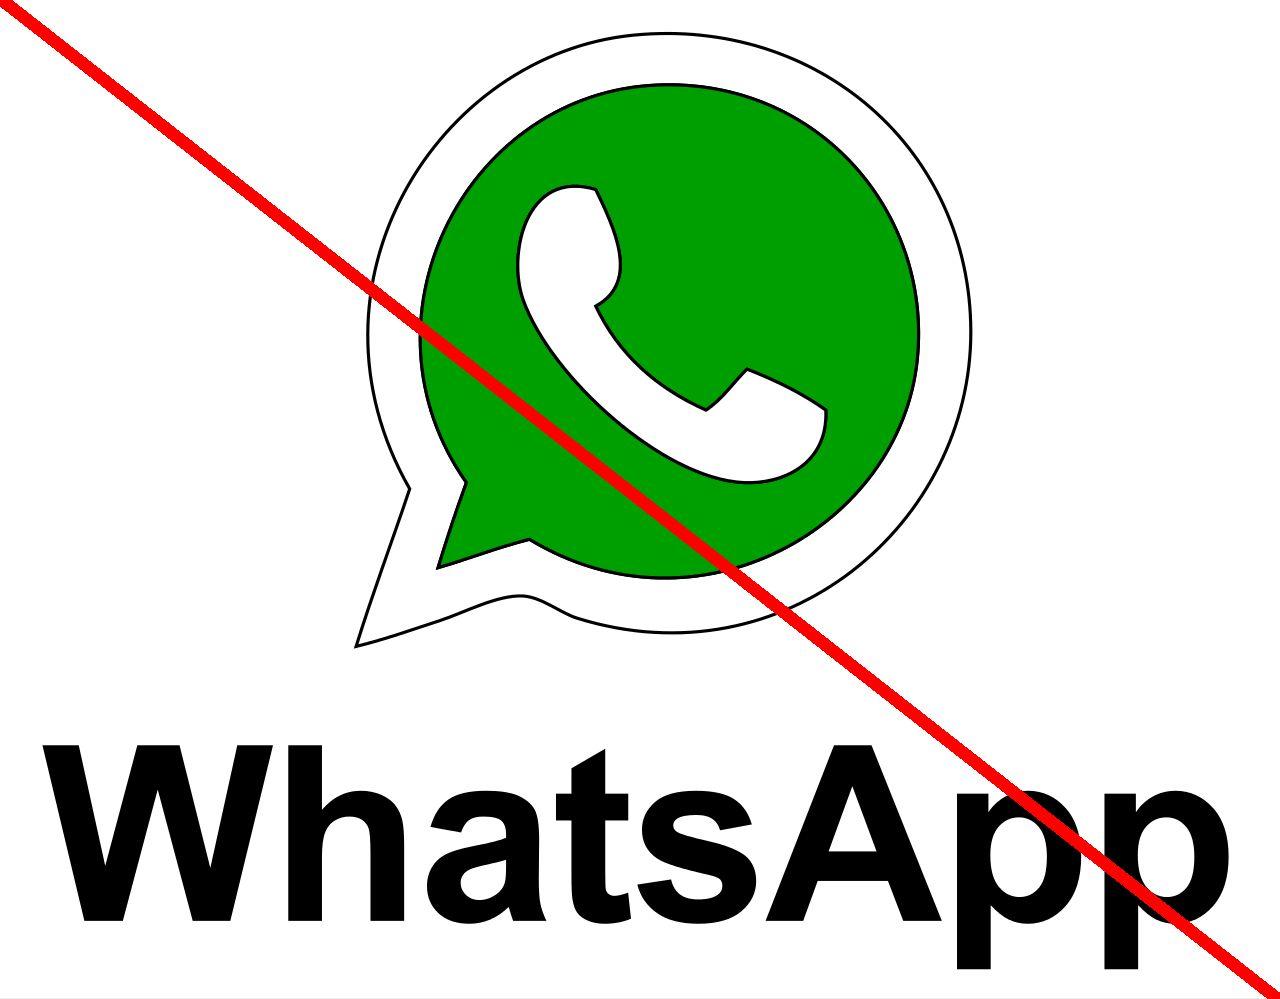 File:No WhatsApp logo.